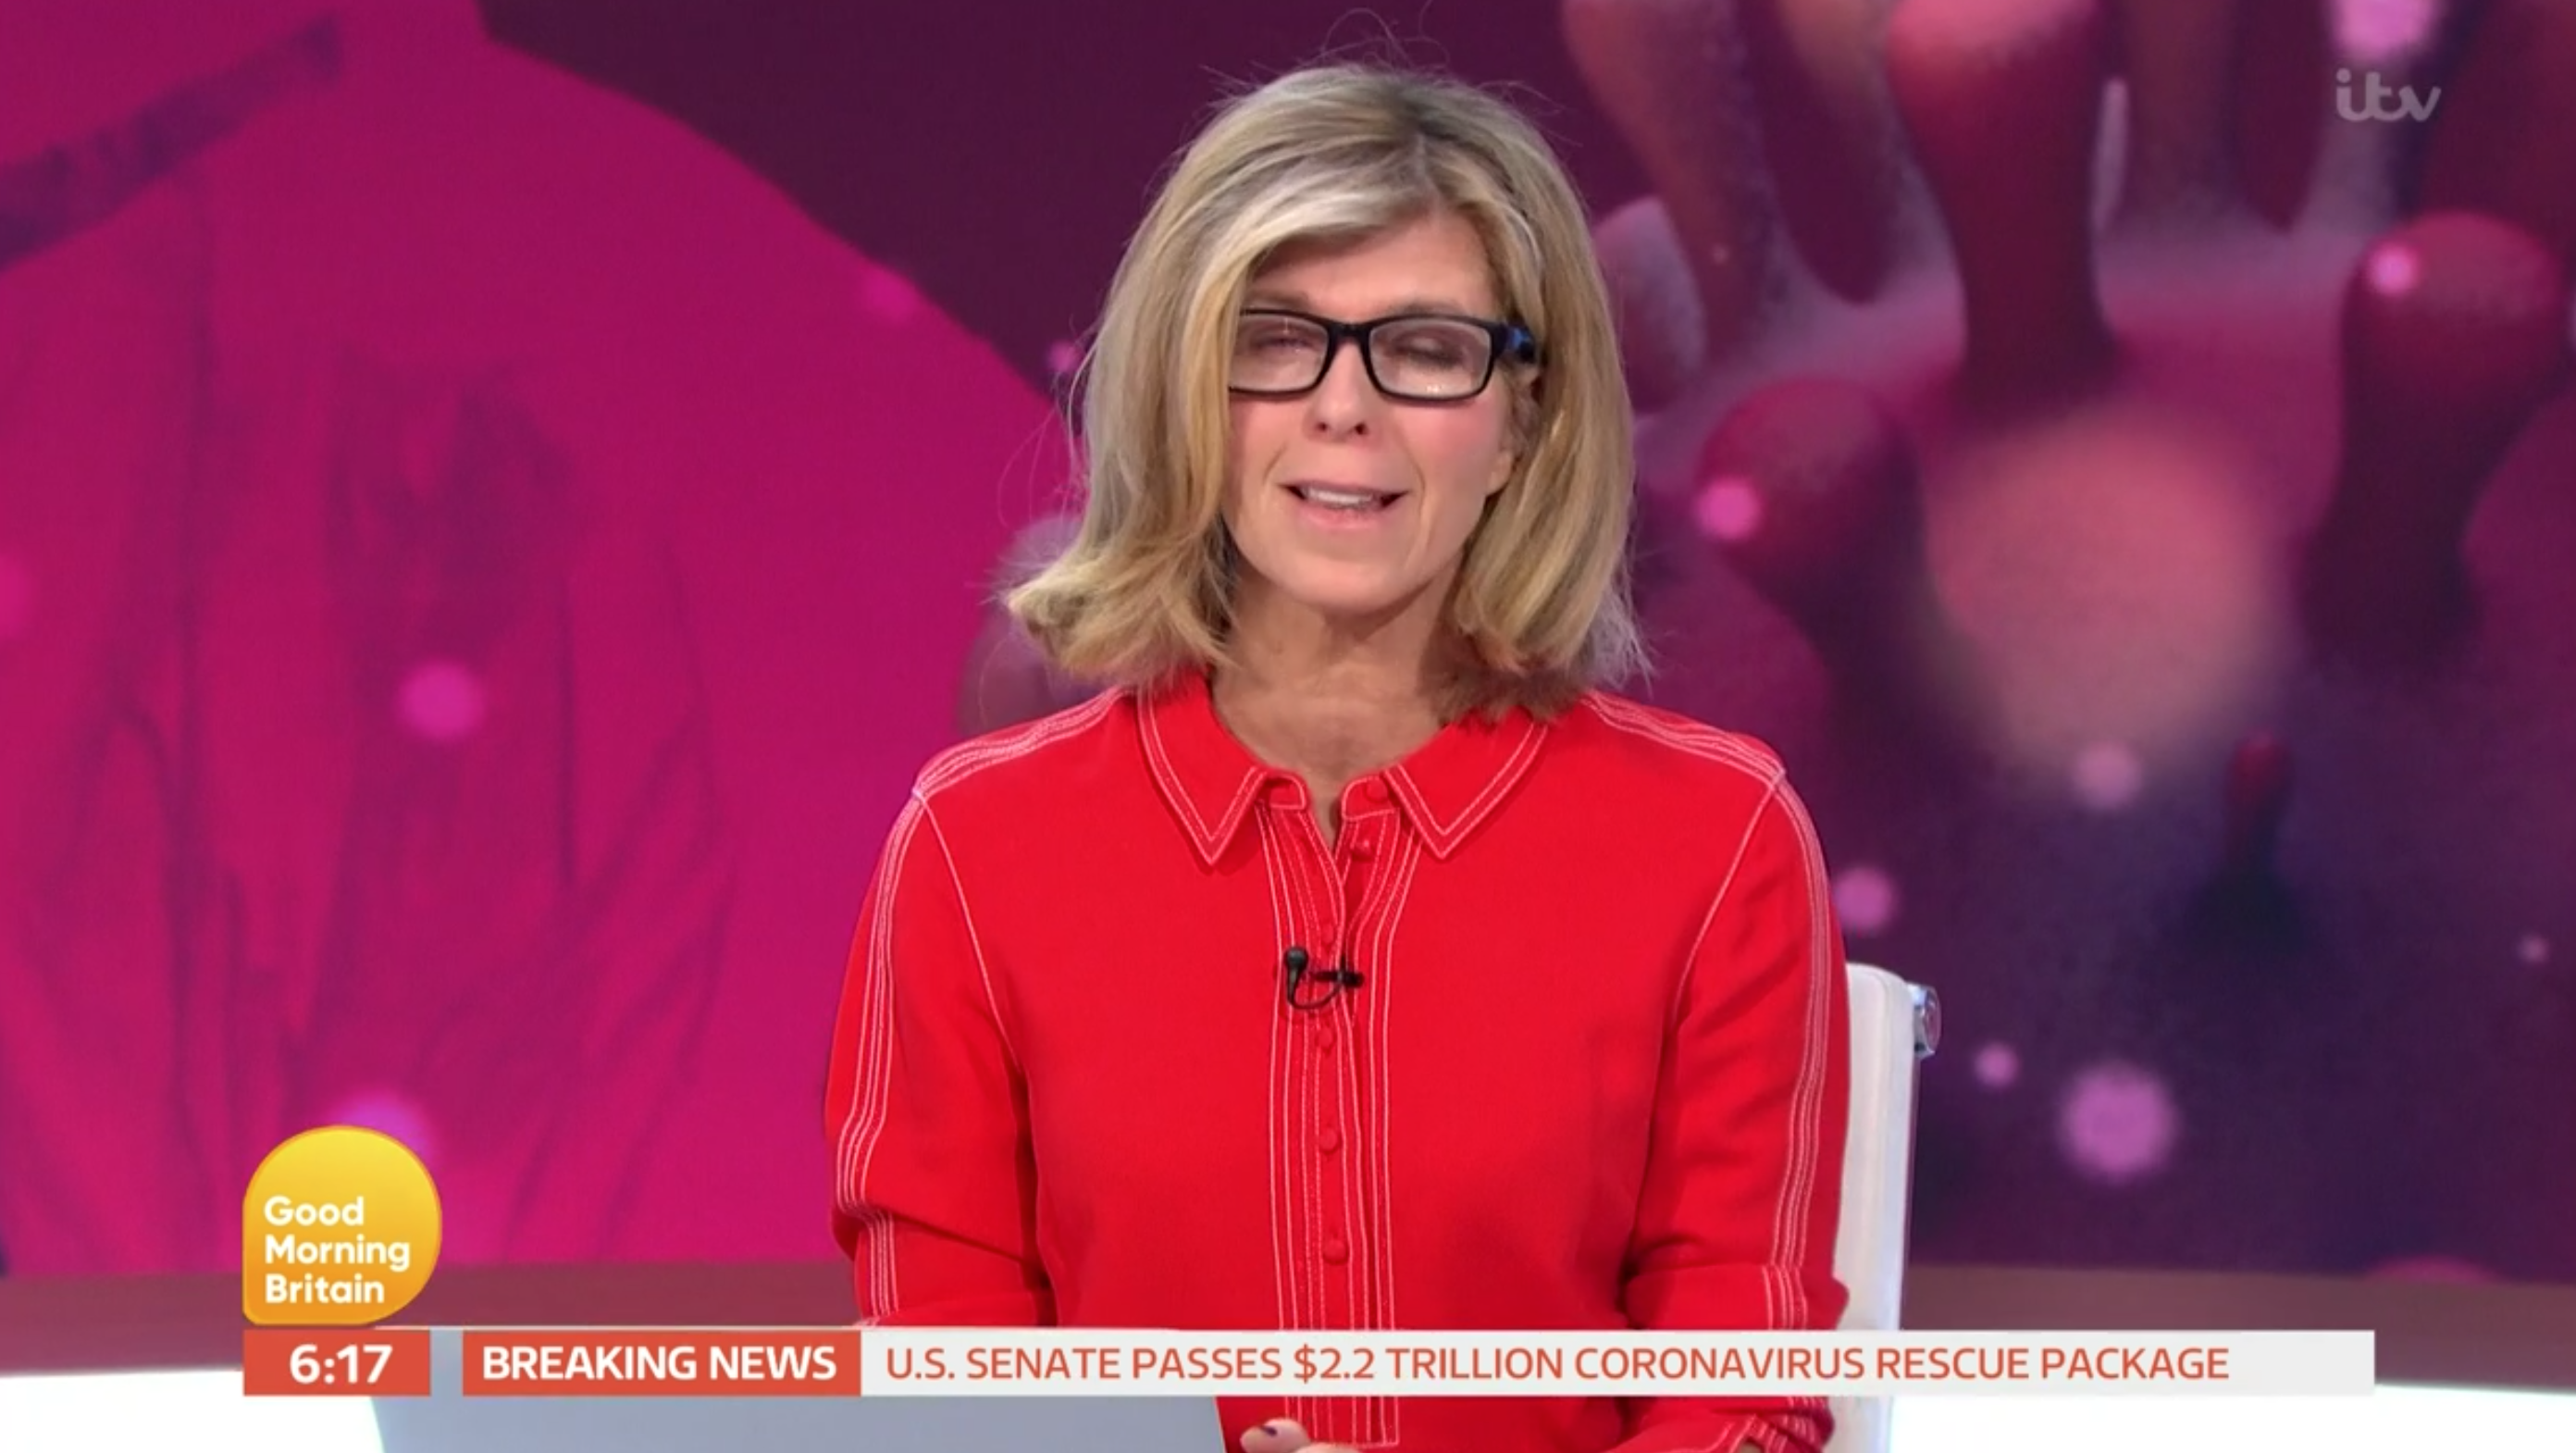 Kate Garraway Good Morning Britain (Credit: ITV)